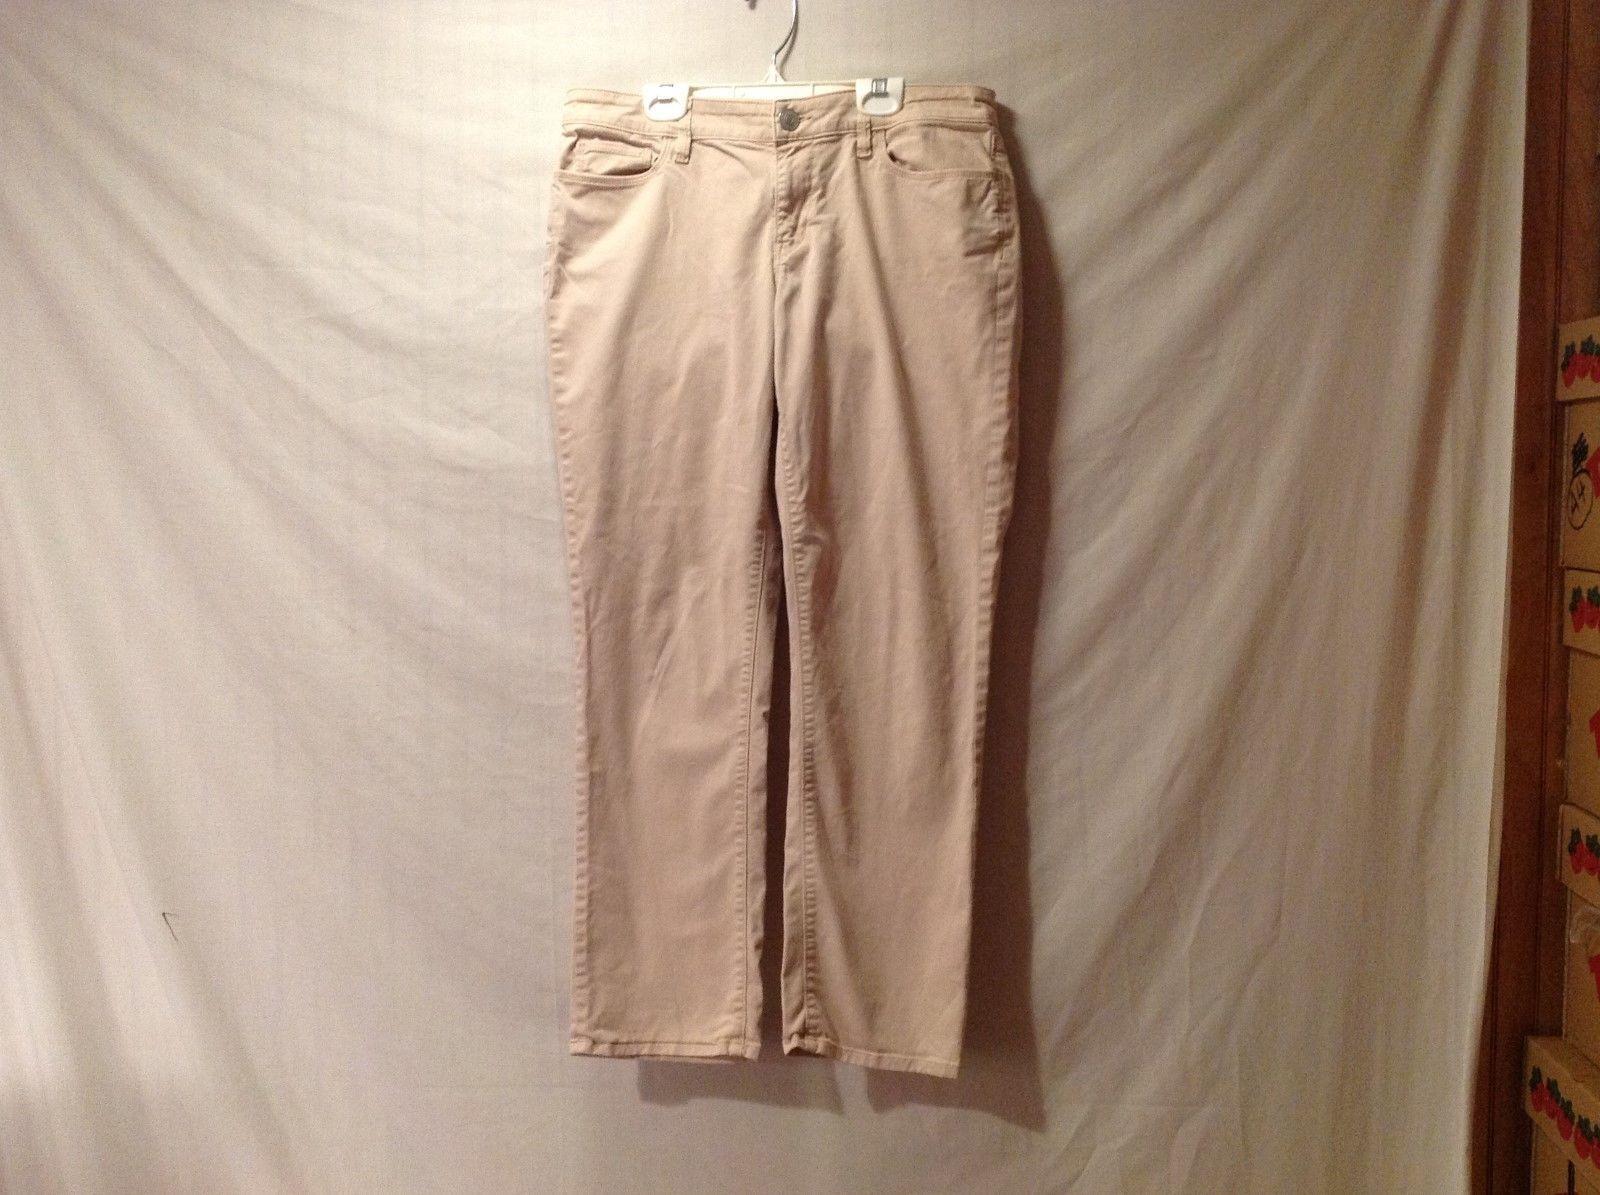 Womens ANN TAYLOR LOFT Size 8 Curvy Straight Cut Peach Colored Jeans